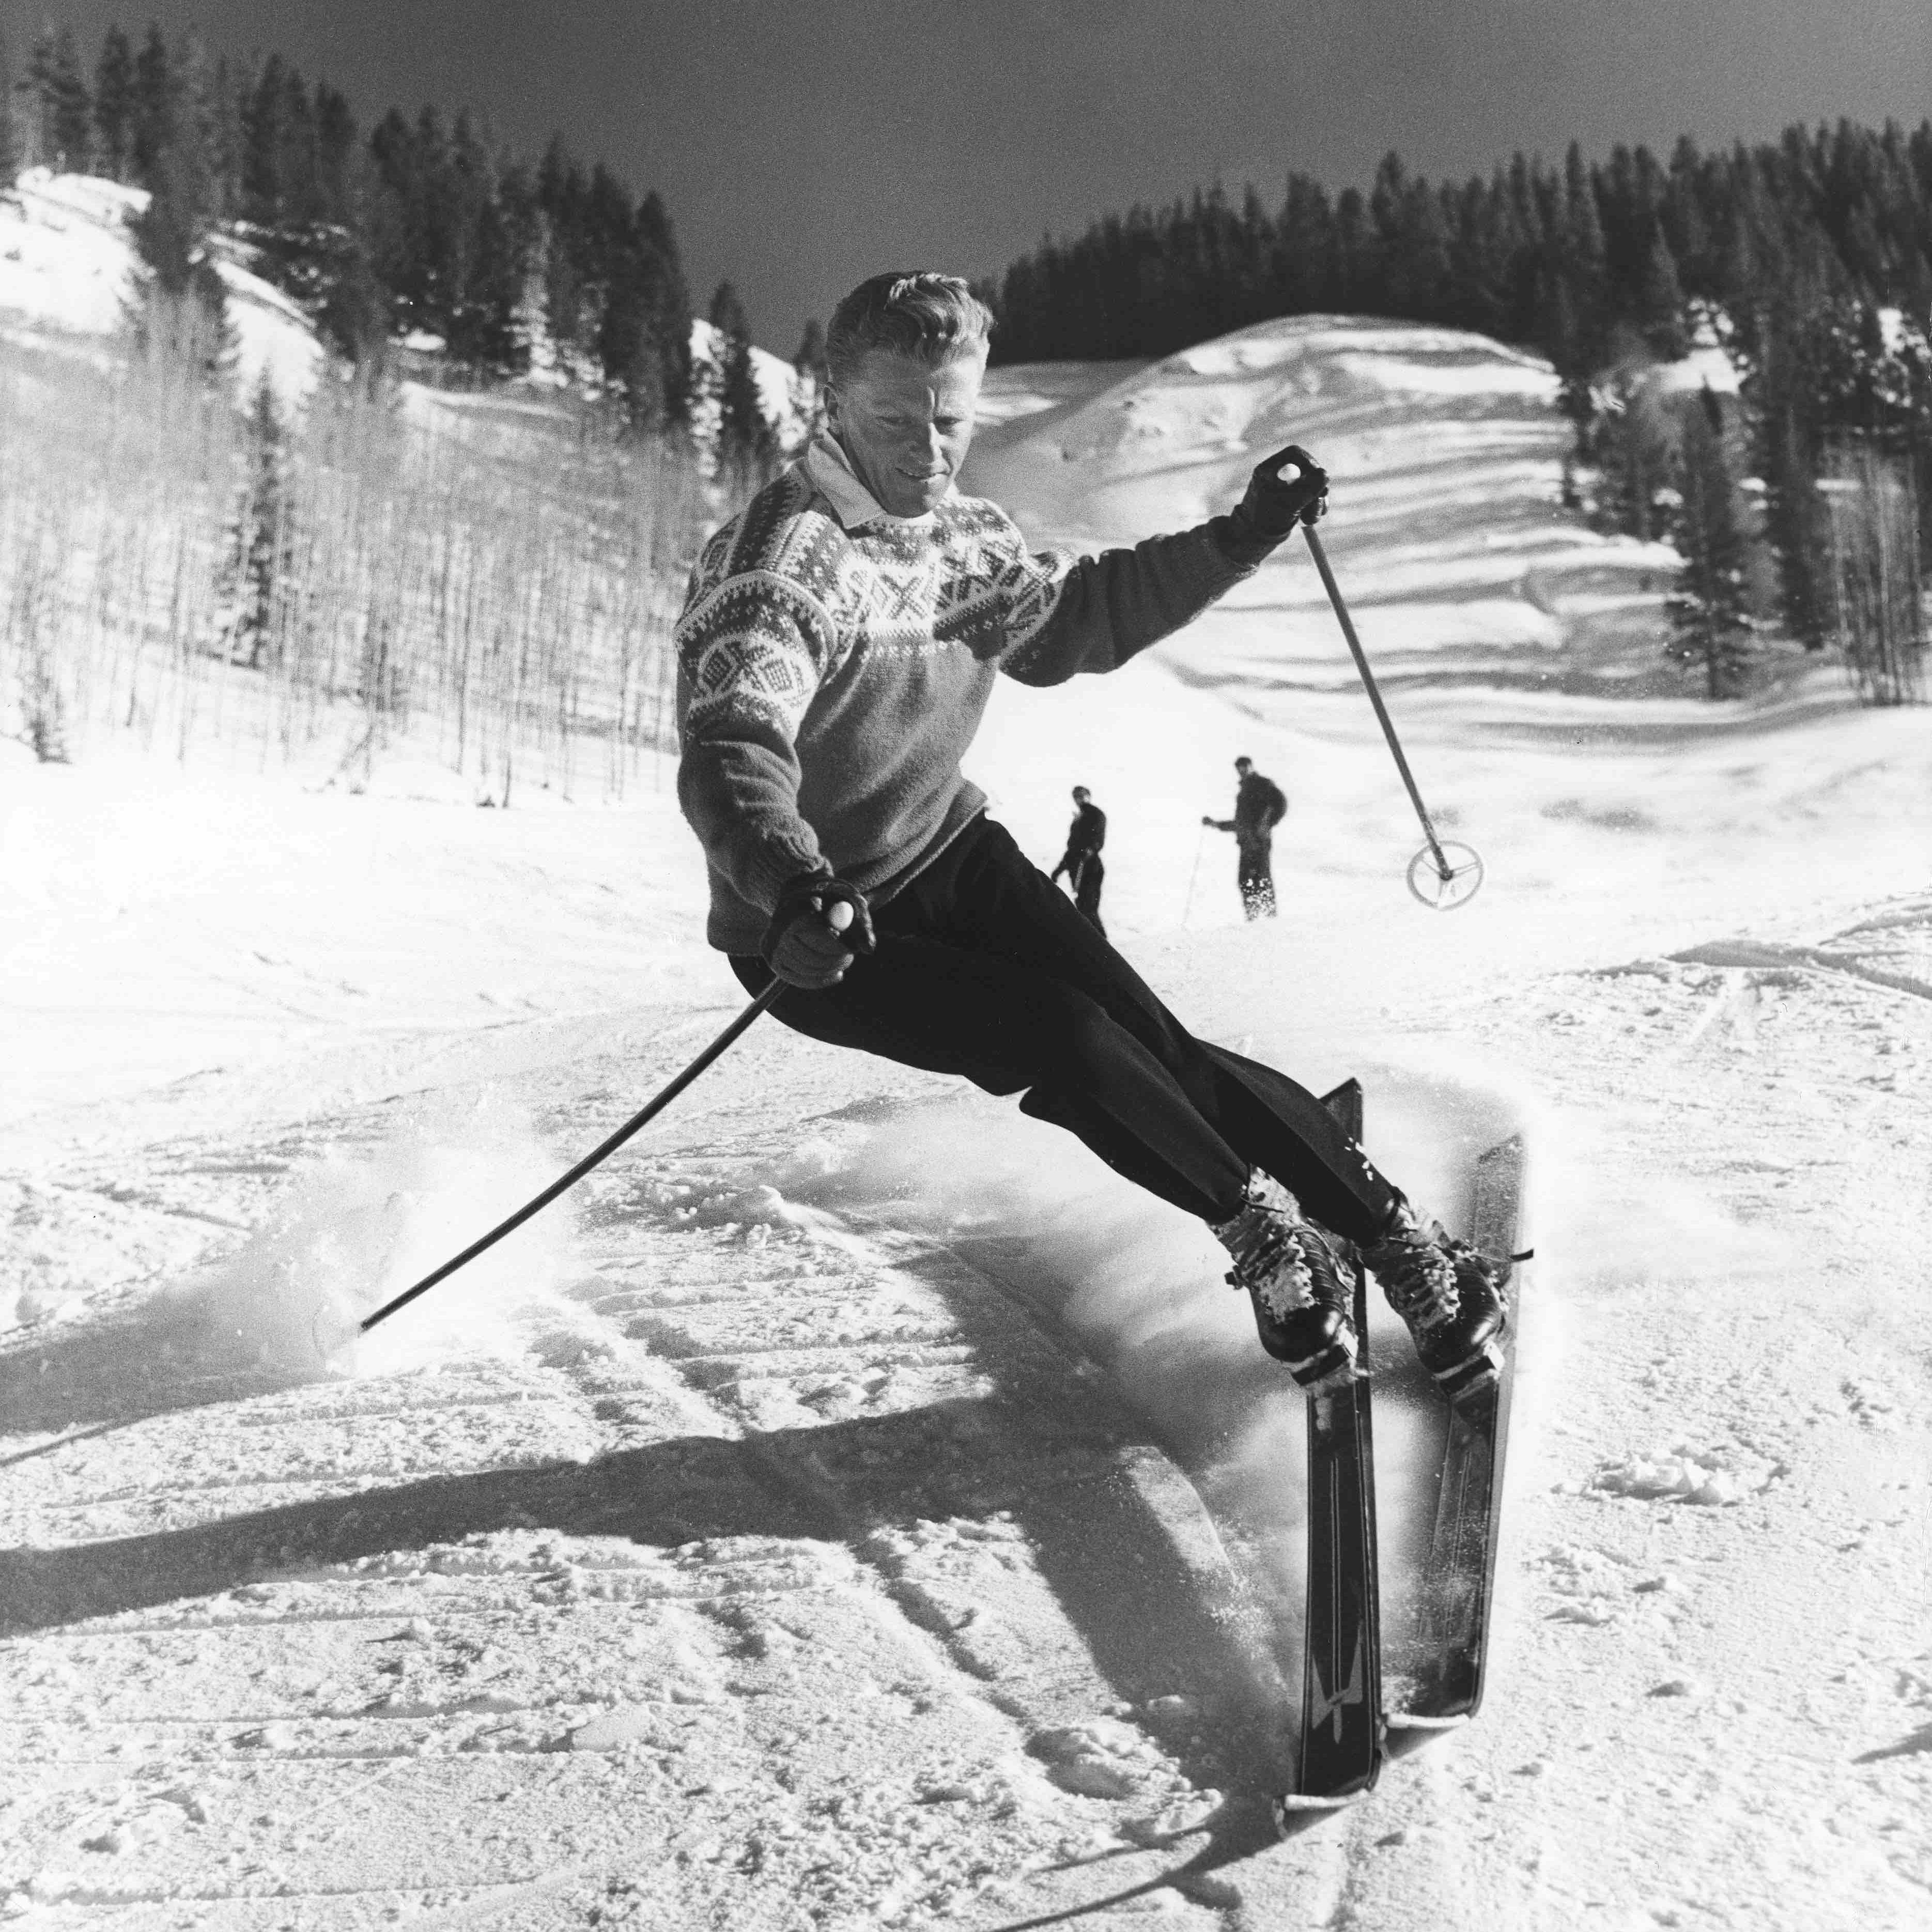 a man skiing